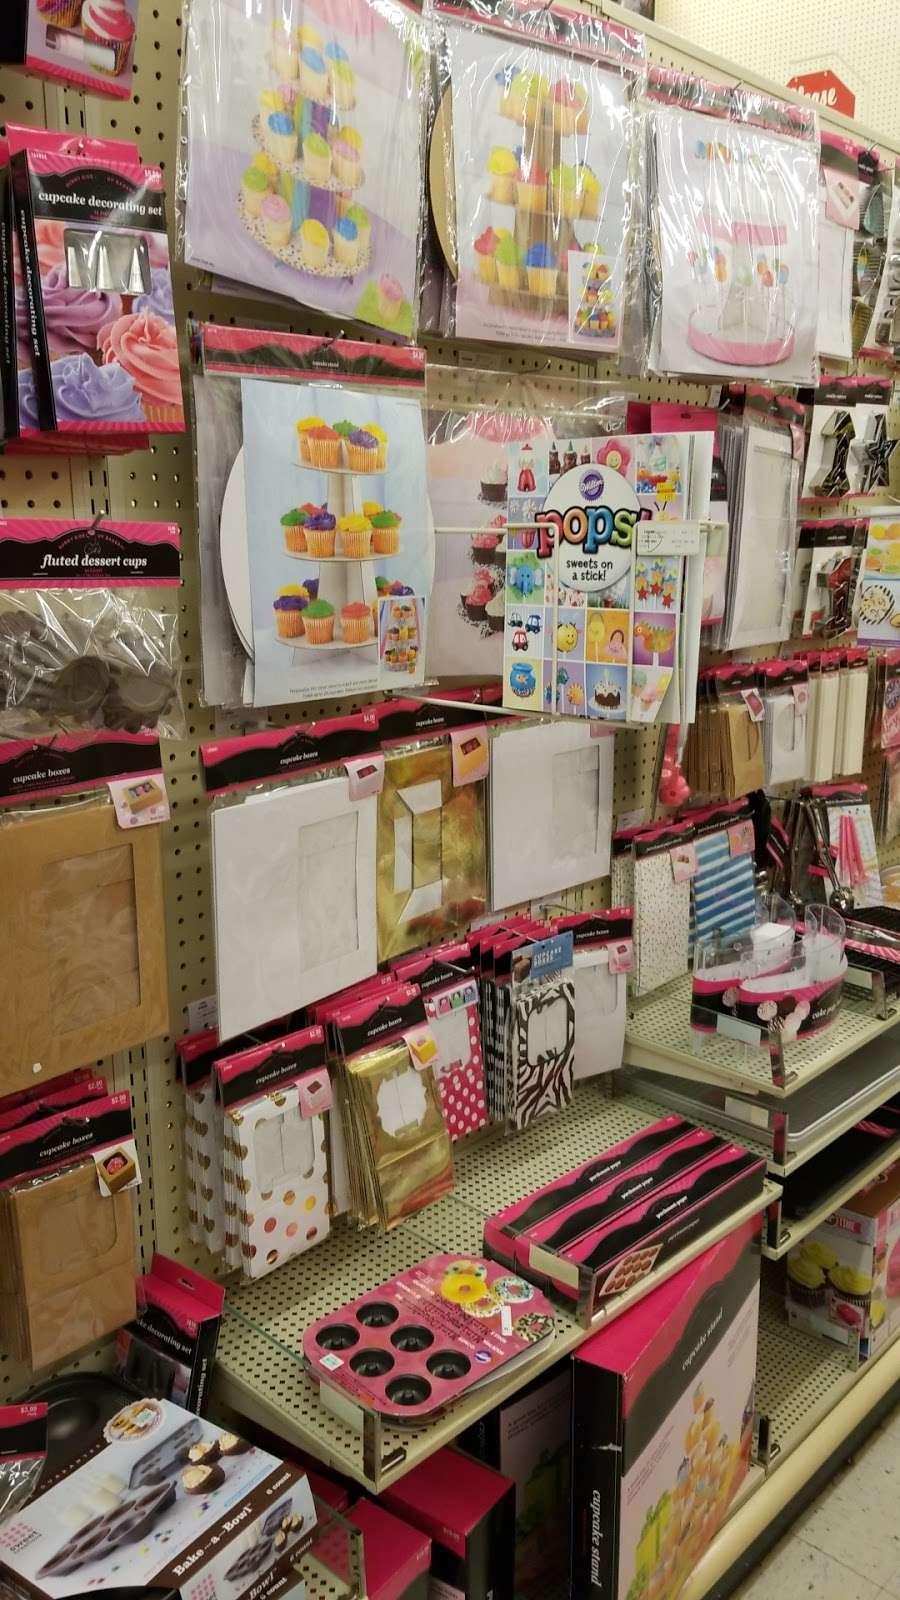 Hobby Lobby - home goods store  | Photo 8 of 10 | Address: 10575 E Washington St, Indianapolis, IN 46229, USA | Phone: (317) 897-1825